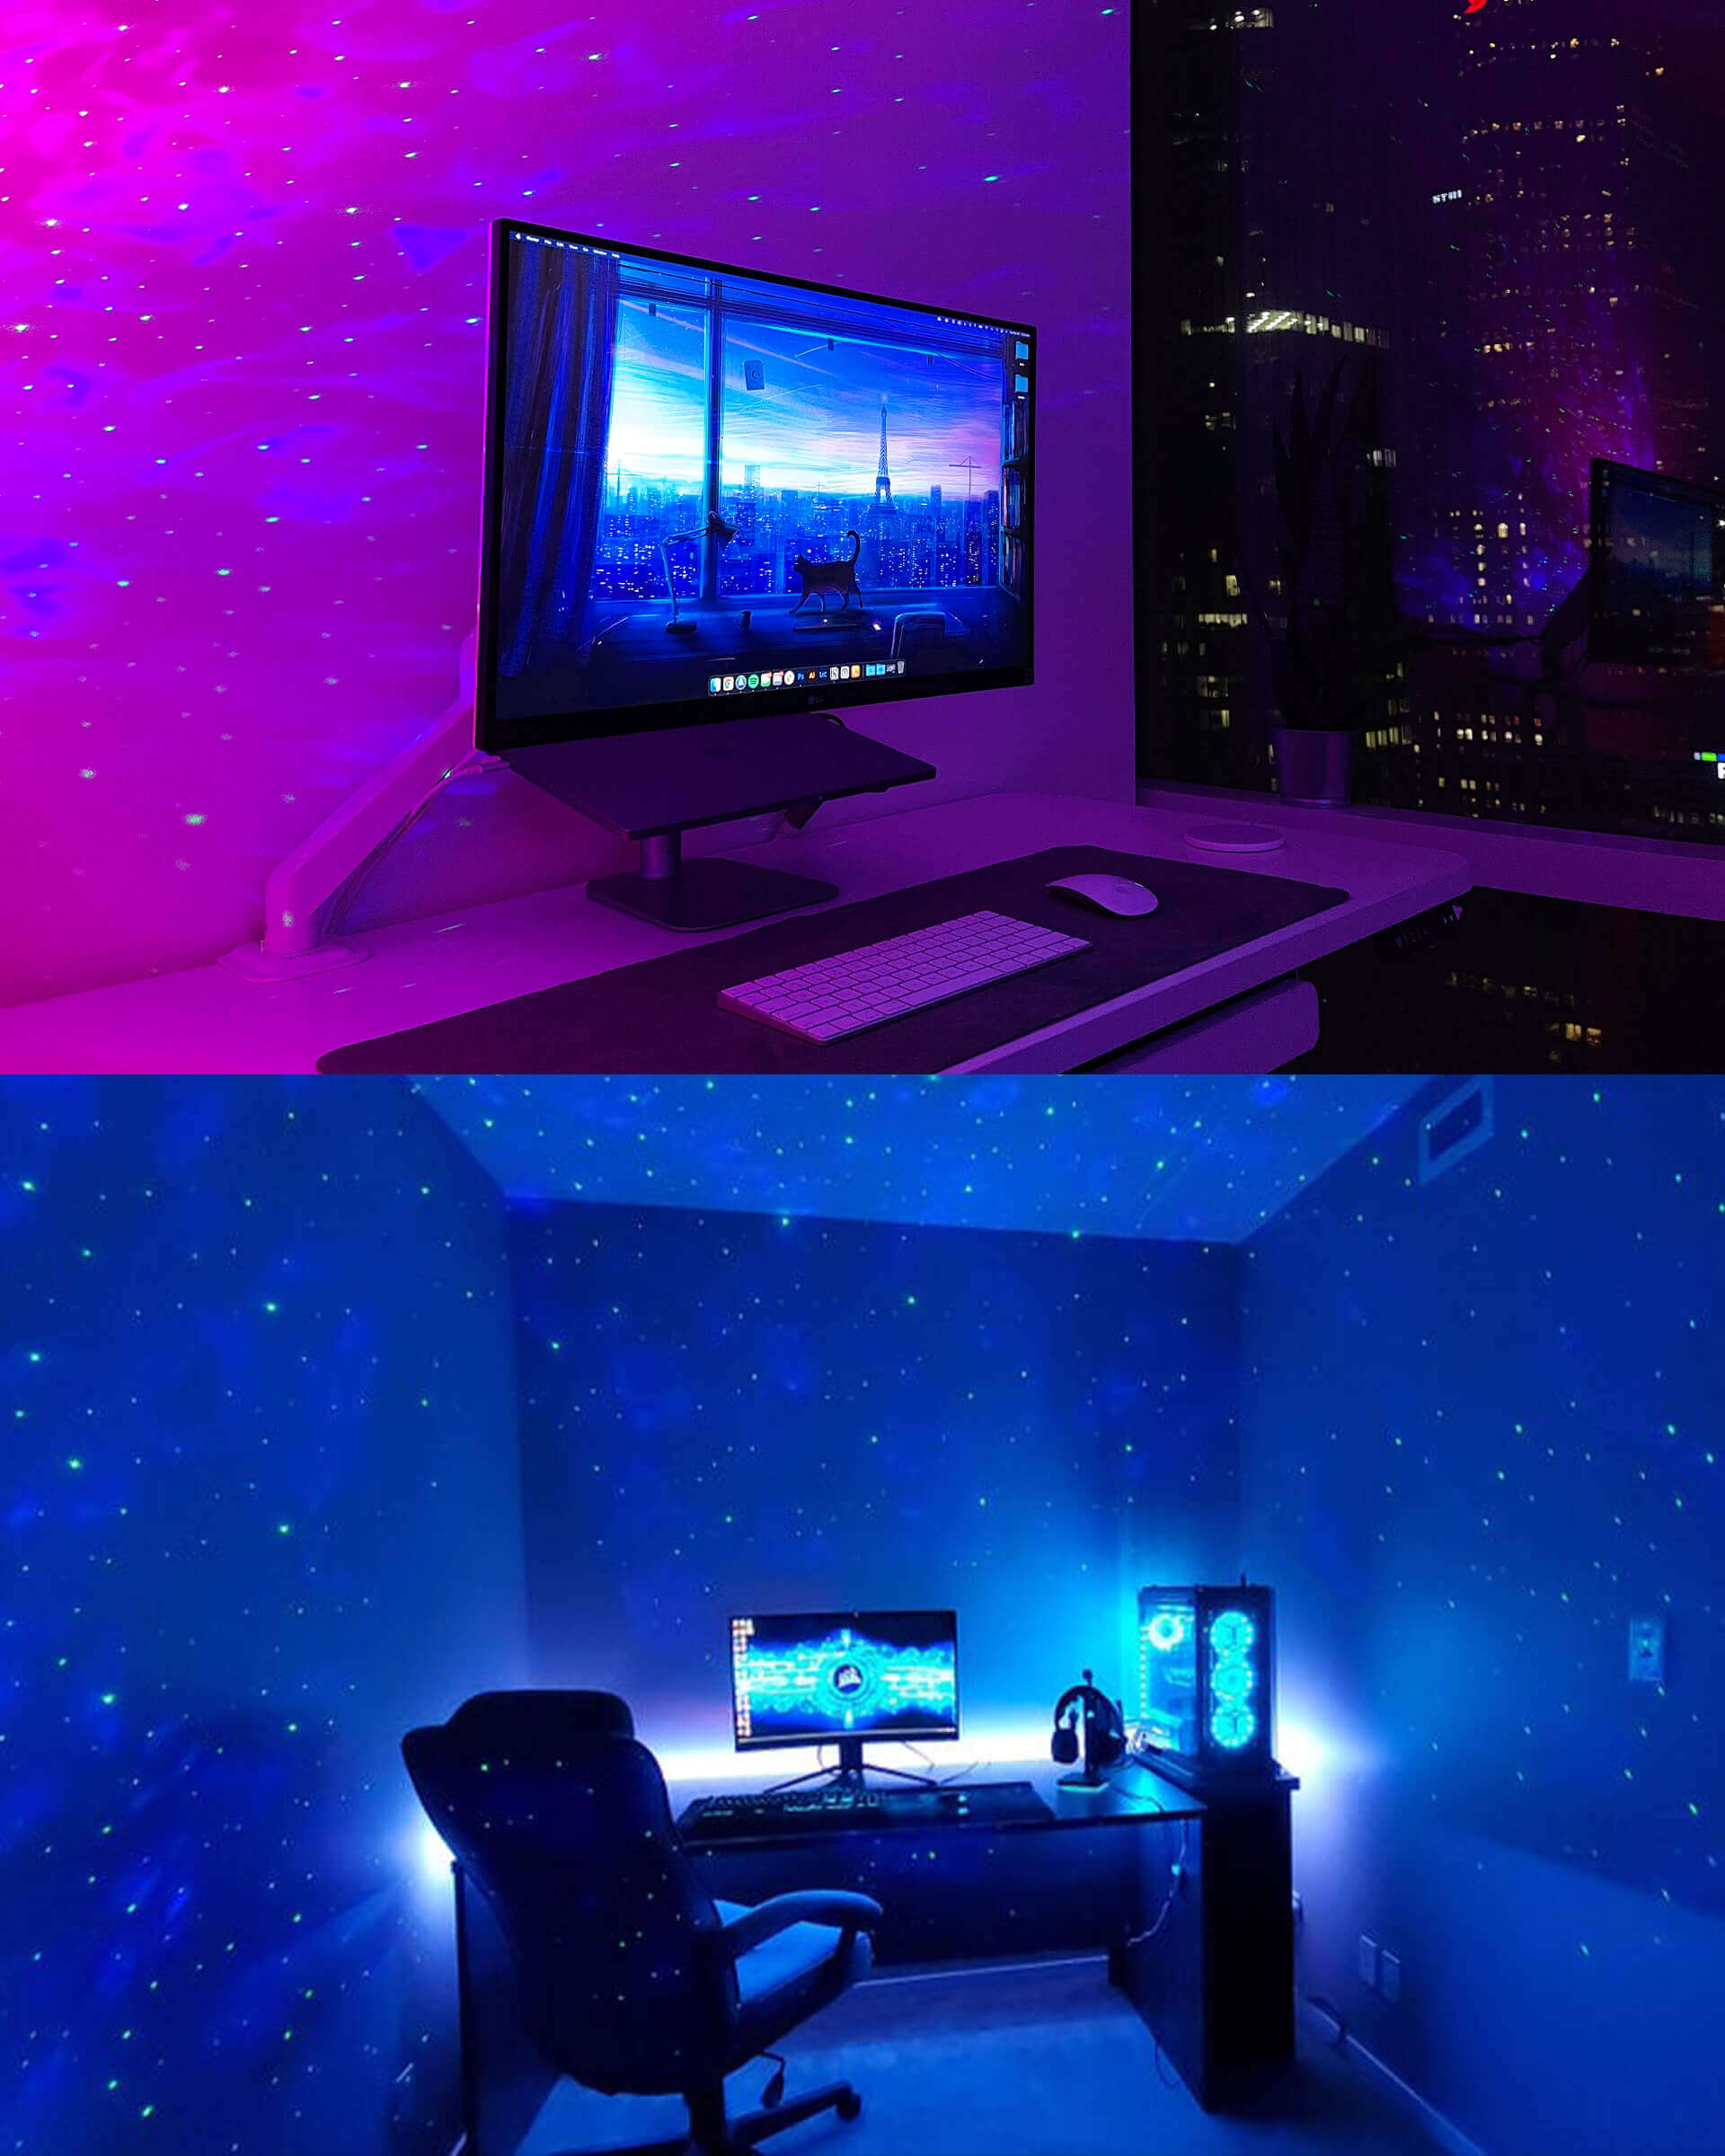 Star Galaxy Light Projector for Desk